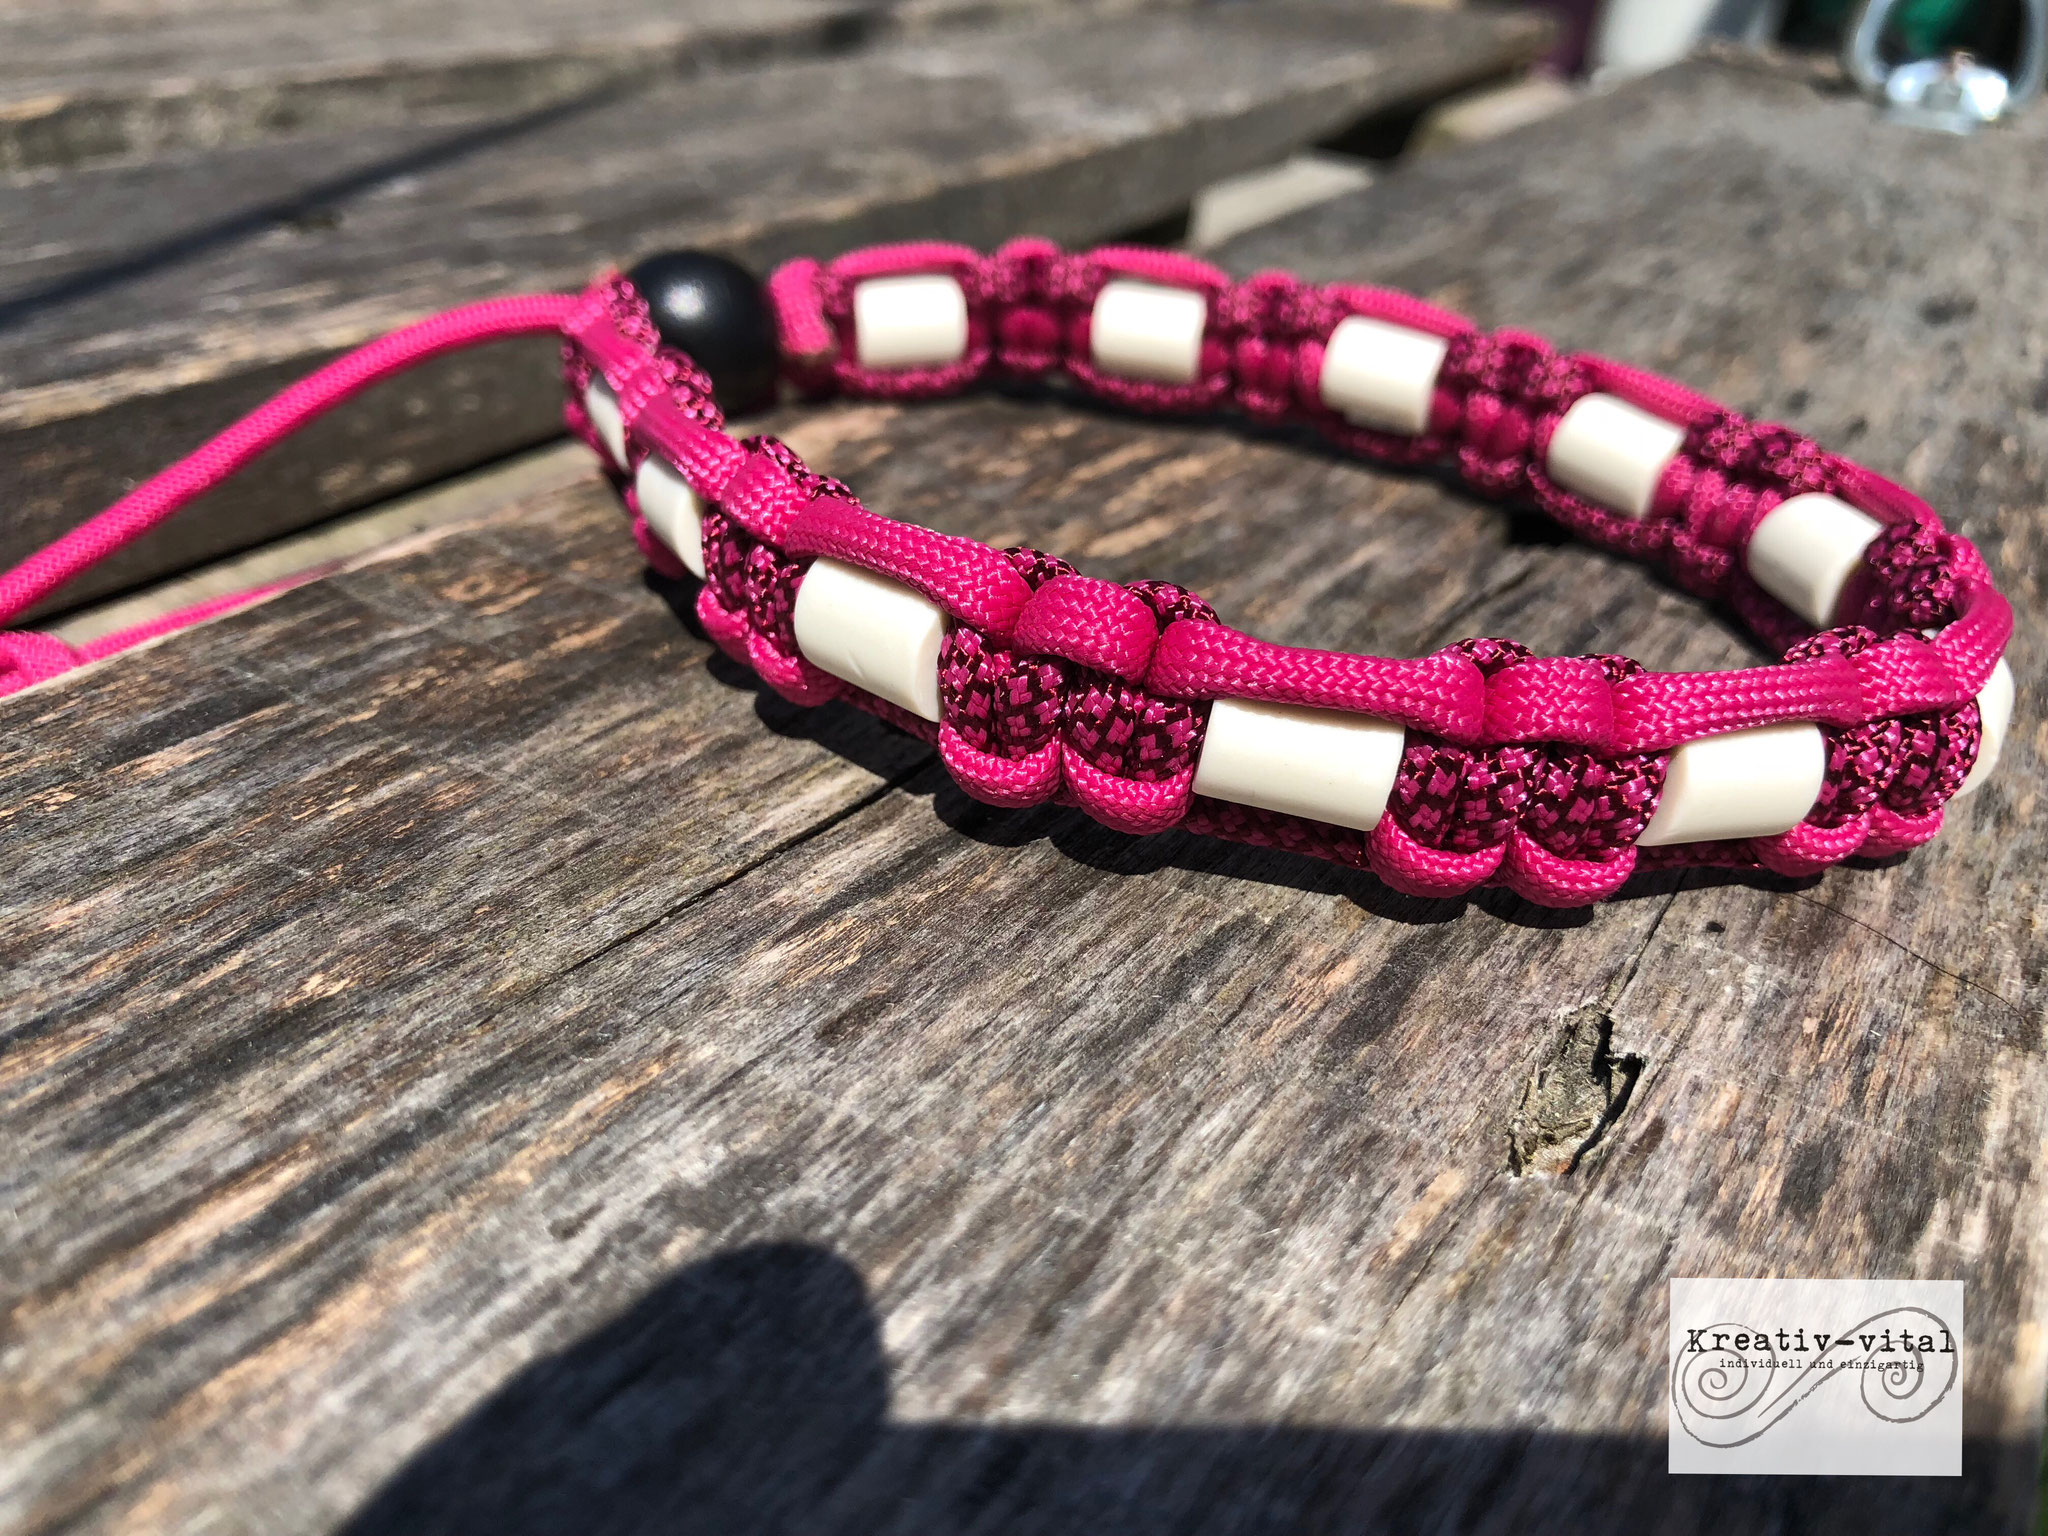 EM Keramik Halsband für Hund/Katze 32-35cm Halsumfang Fuchsia/Burgundy